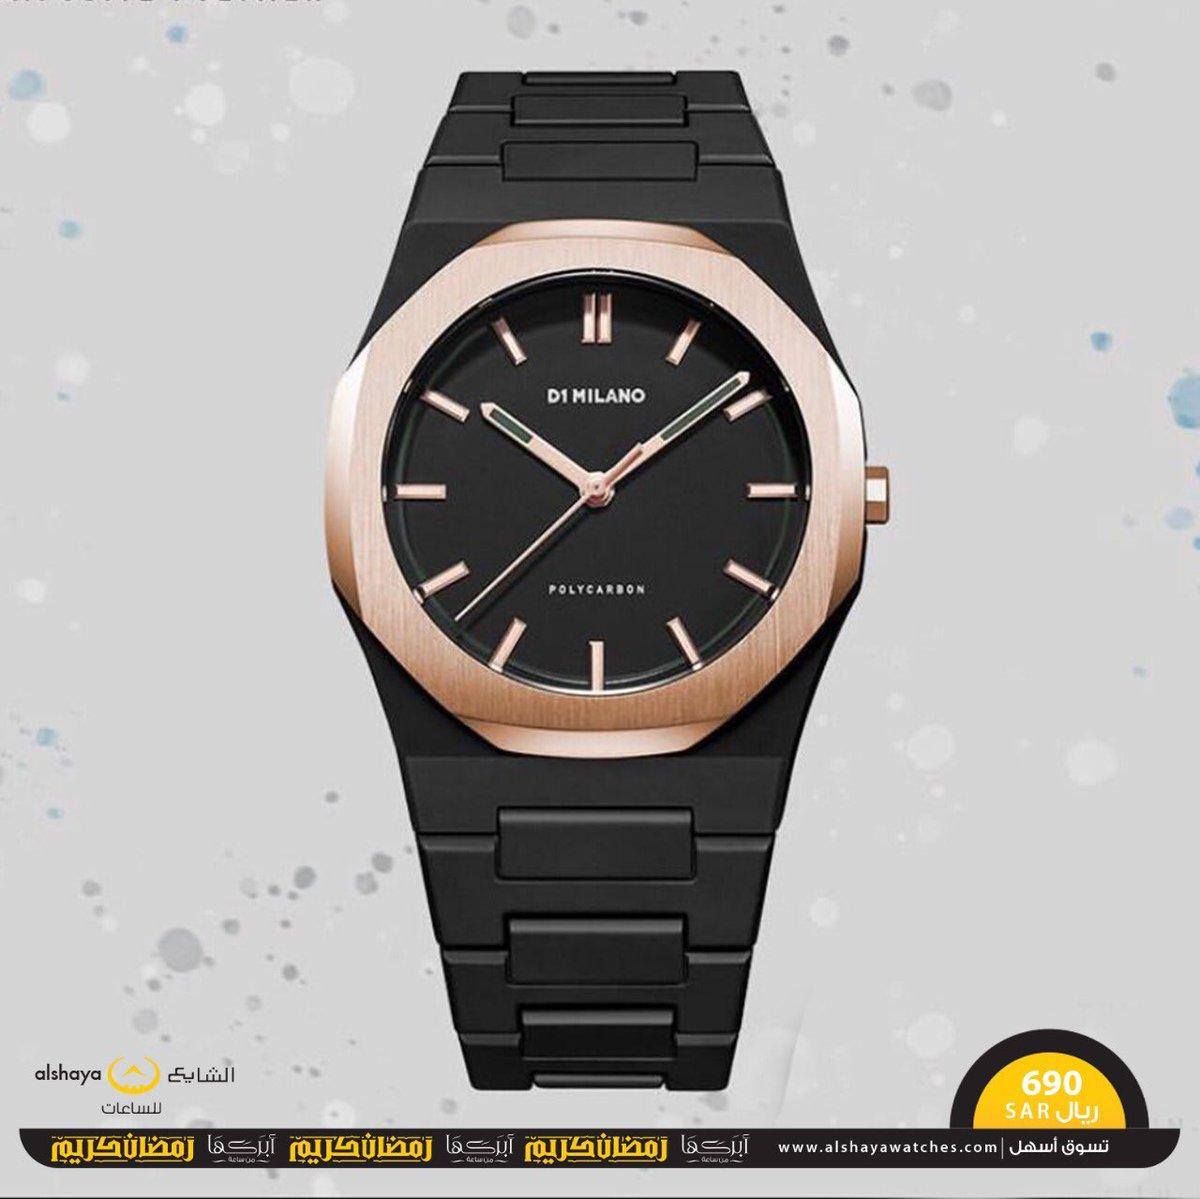 a49a89309 تسوق الآن .. https://alshayawatches.com/ar/products/d1-milano-moonglade-men -s-watch-ml-0107 …pic.twitter.com/sTYQgmf1dE